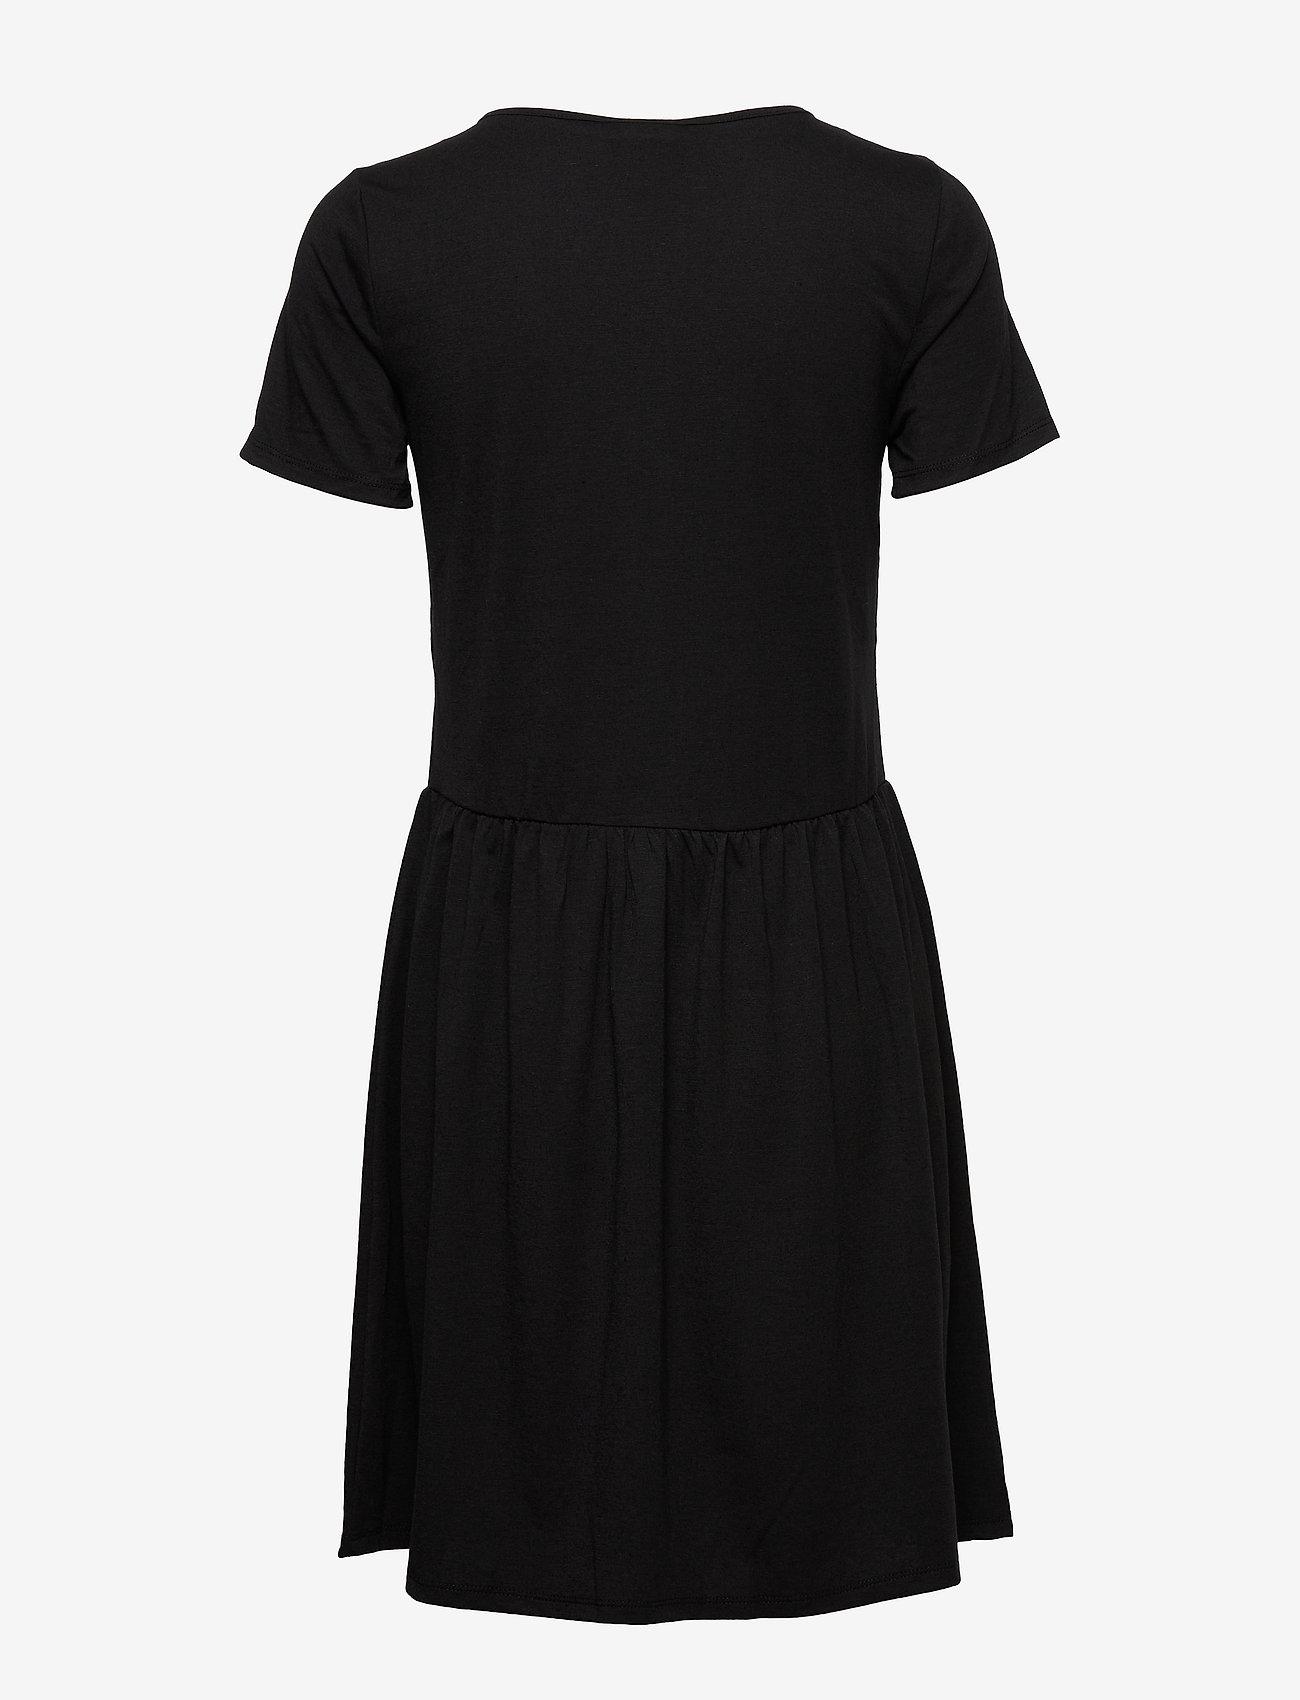 Vila - VIANIKA S/S DRESS - midi dresses - black